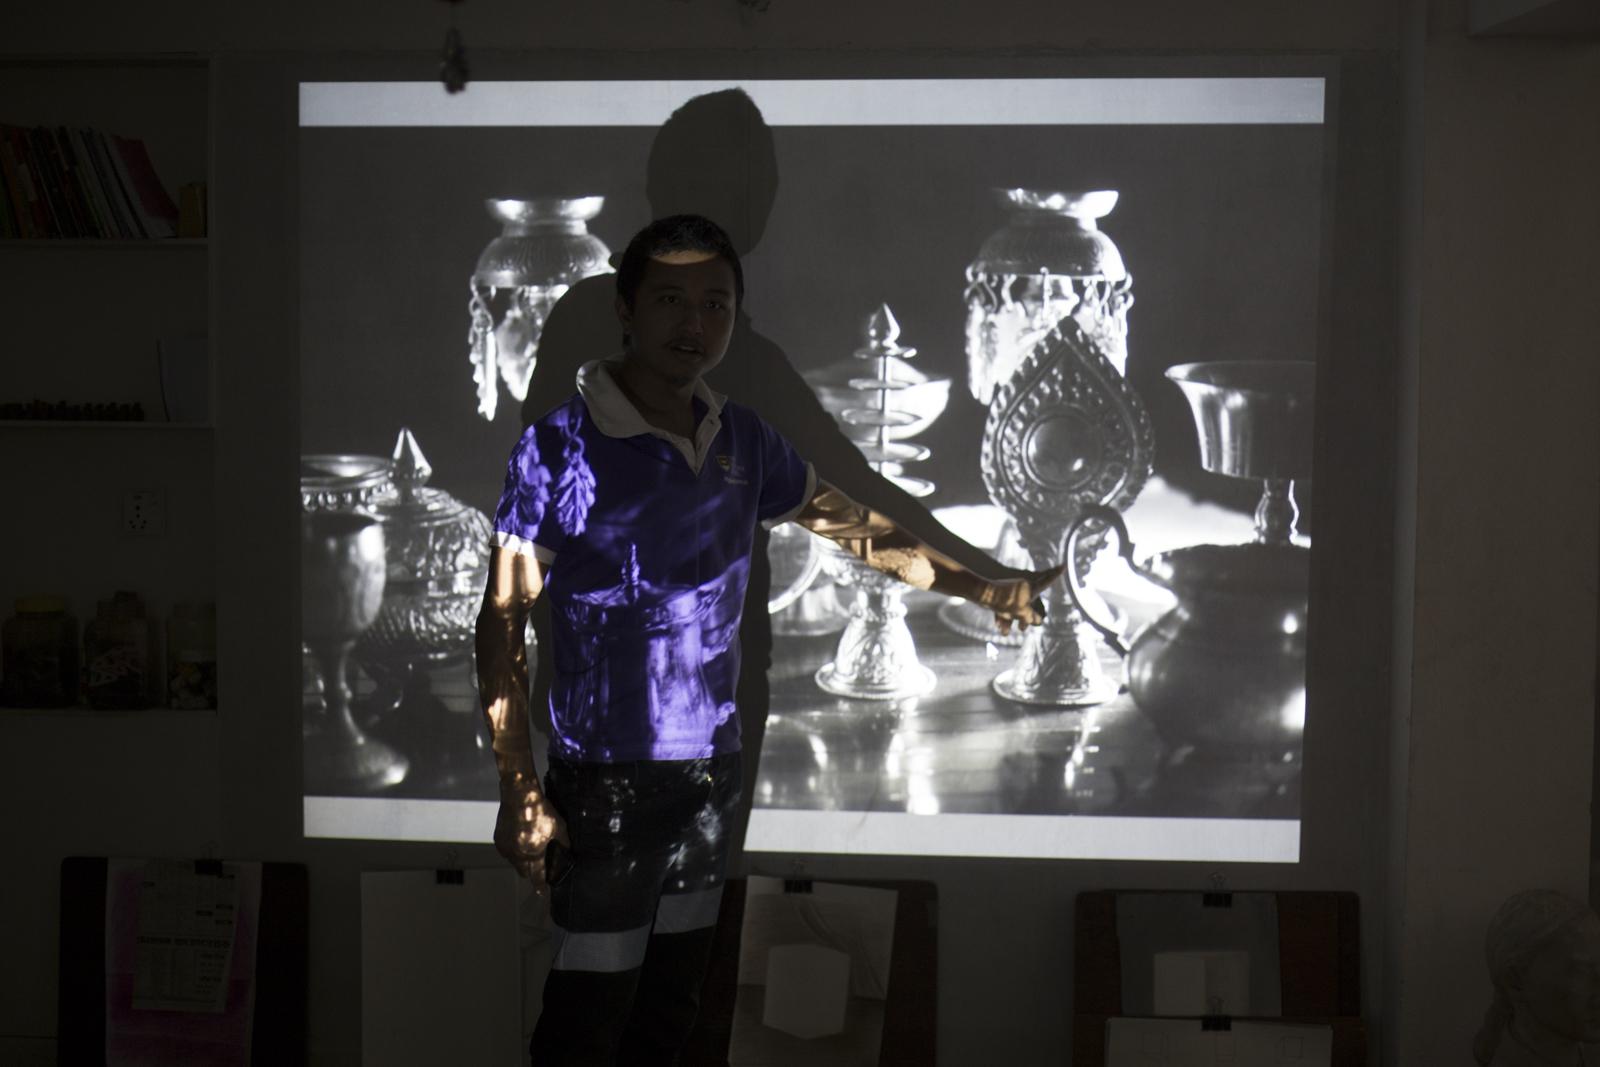 Artudio Photography Workshop 59th Batch Level I. Photo: Yugal Shrestha, Artudio